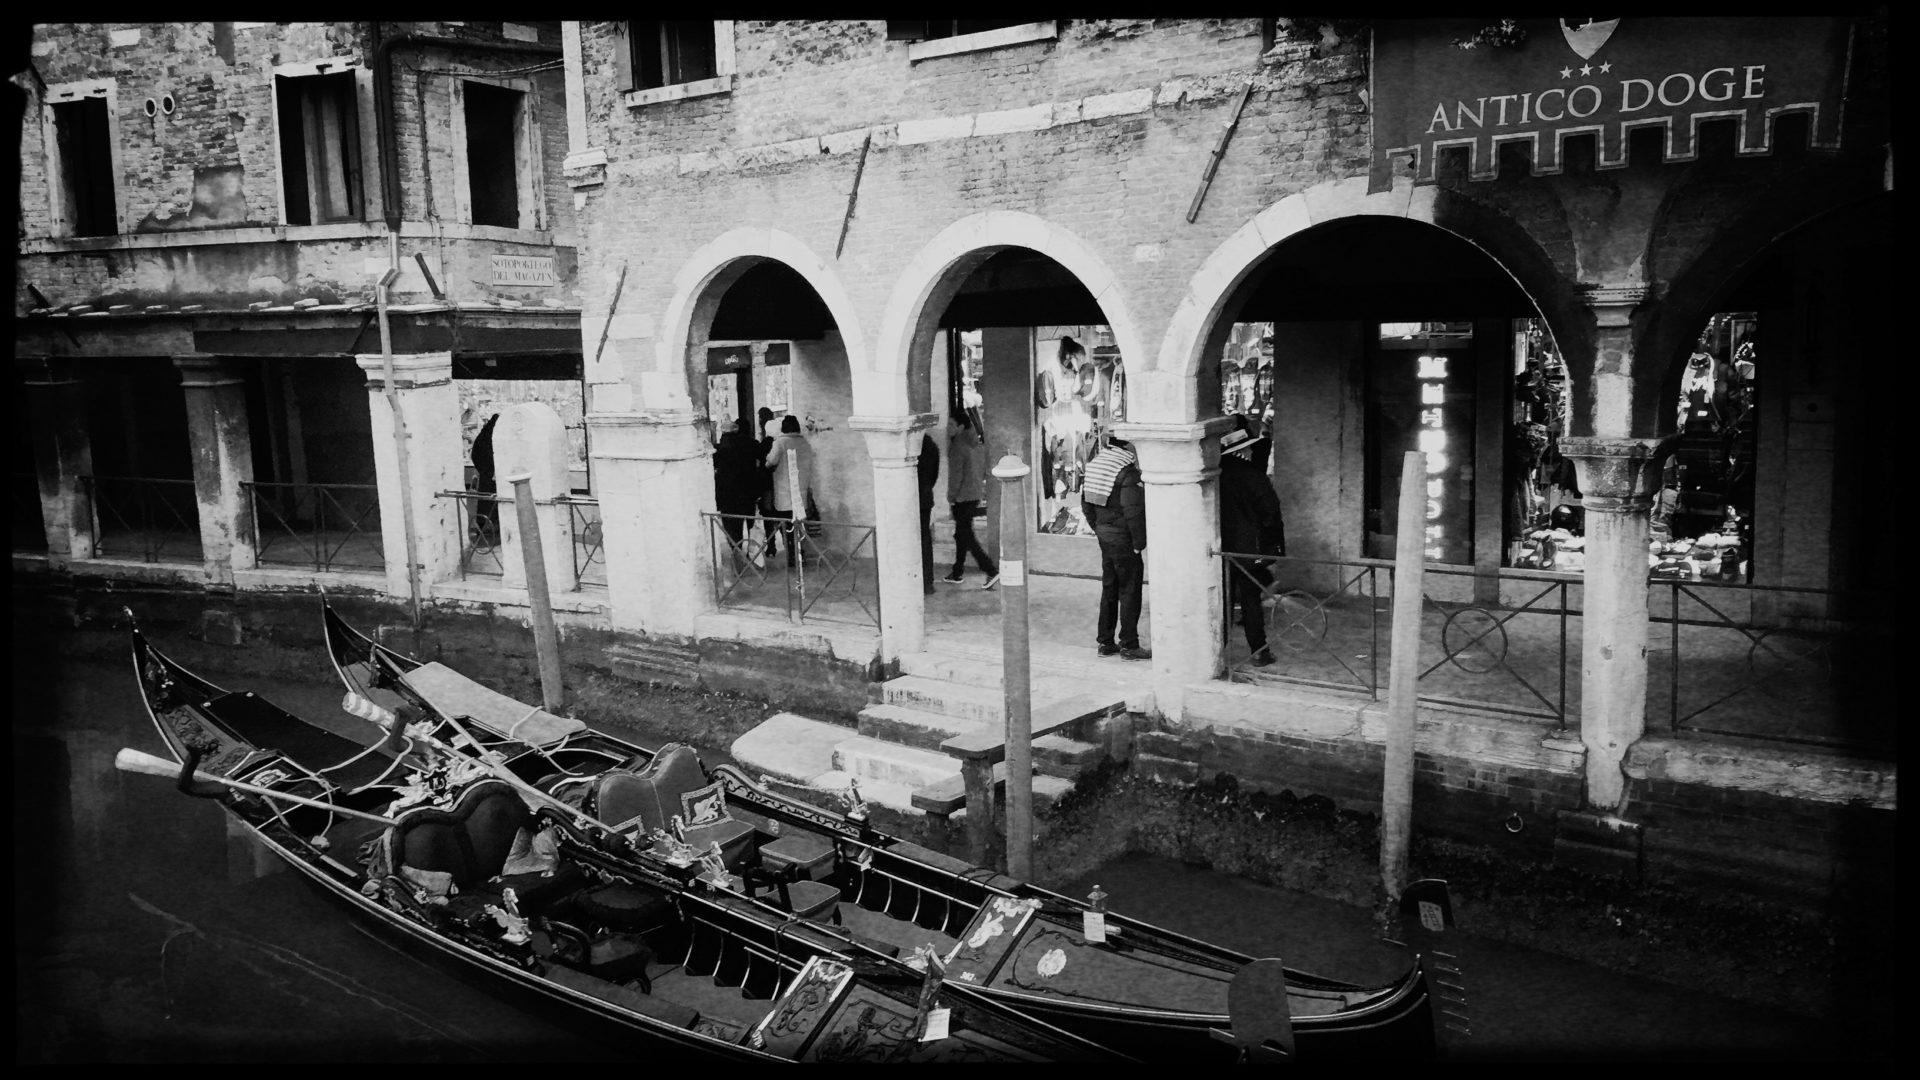 Gondeln am Hotel Antico Doge in Venedig